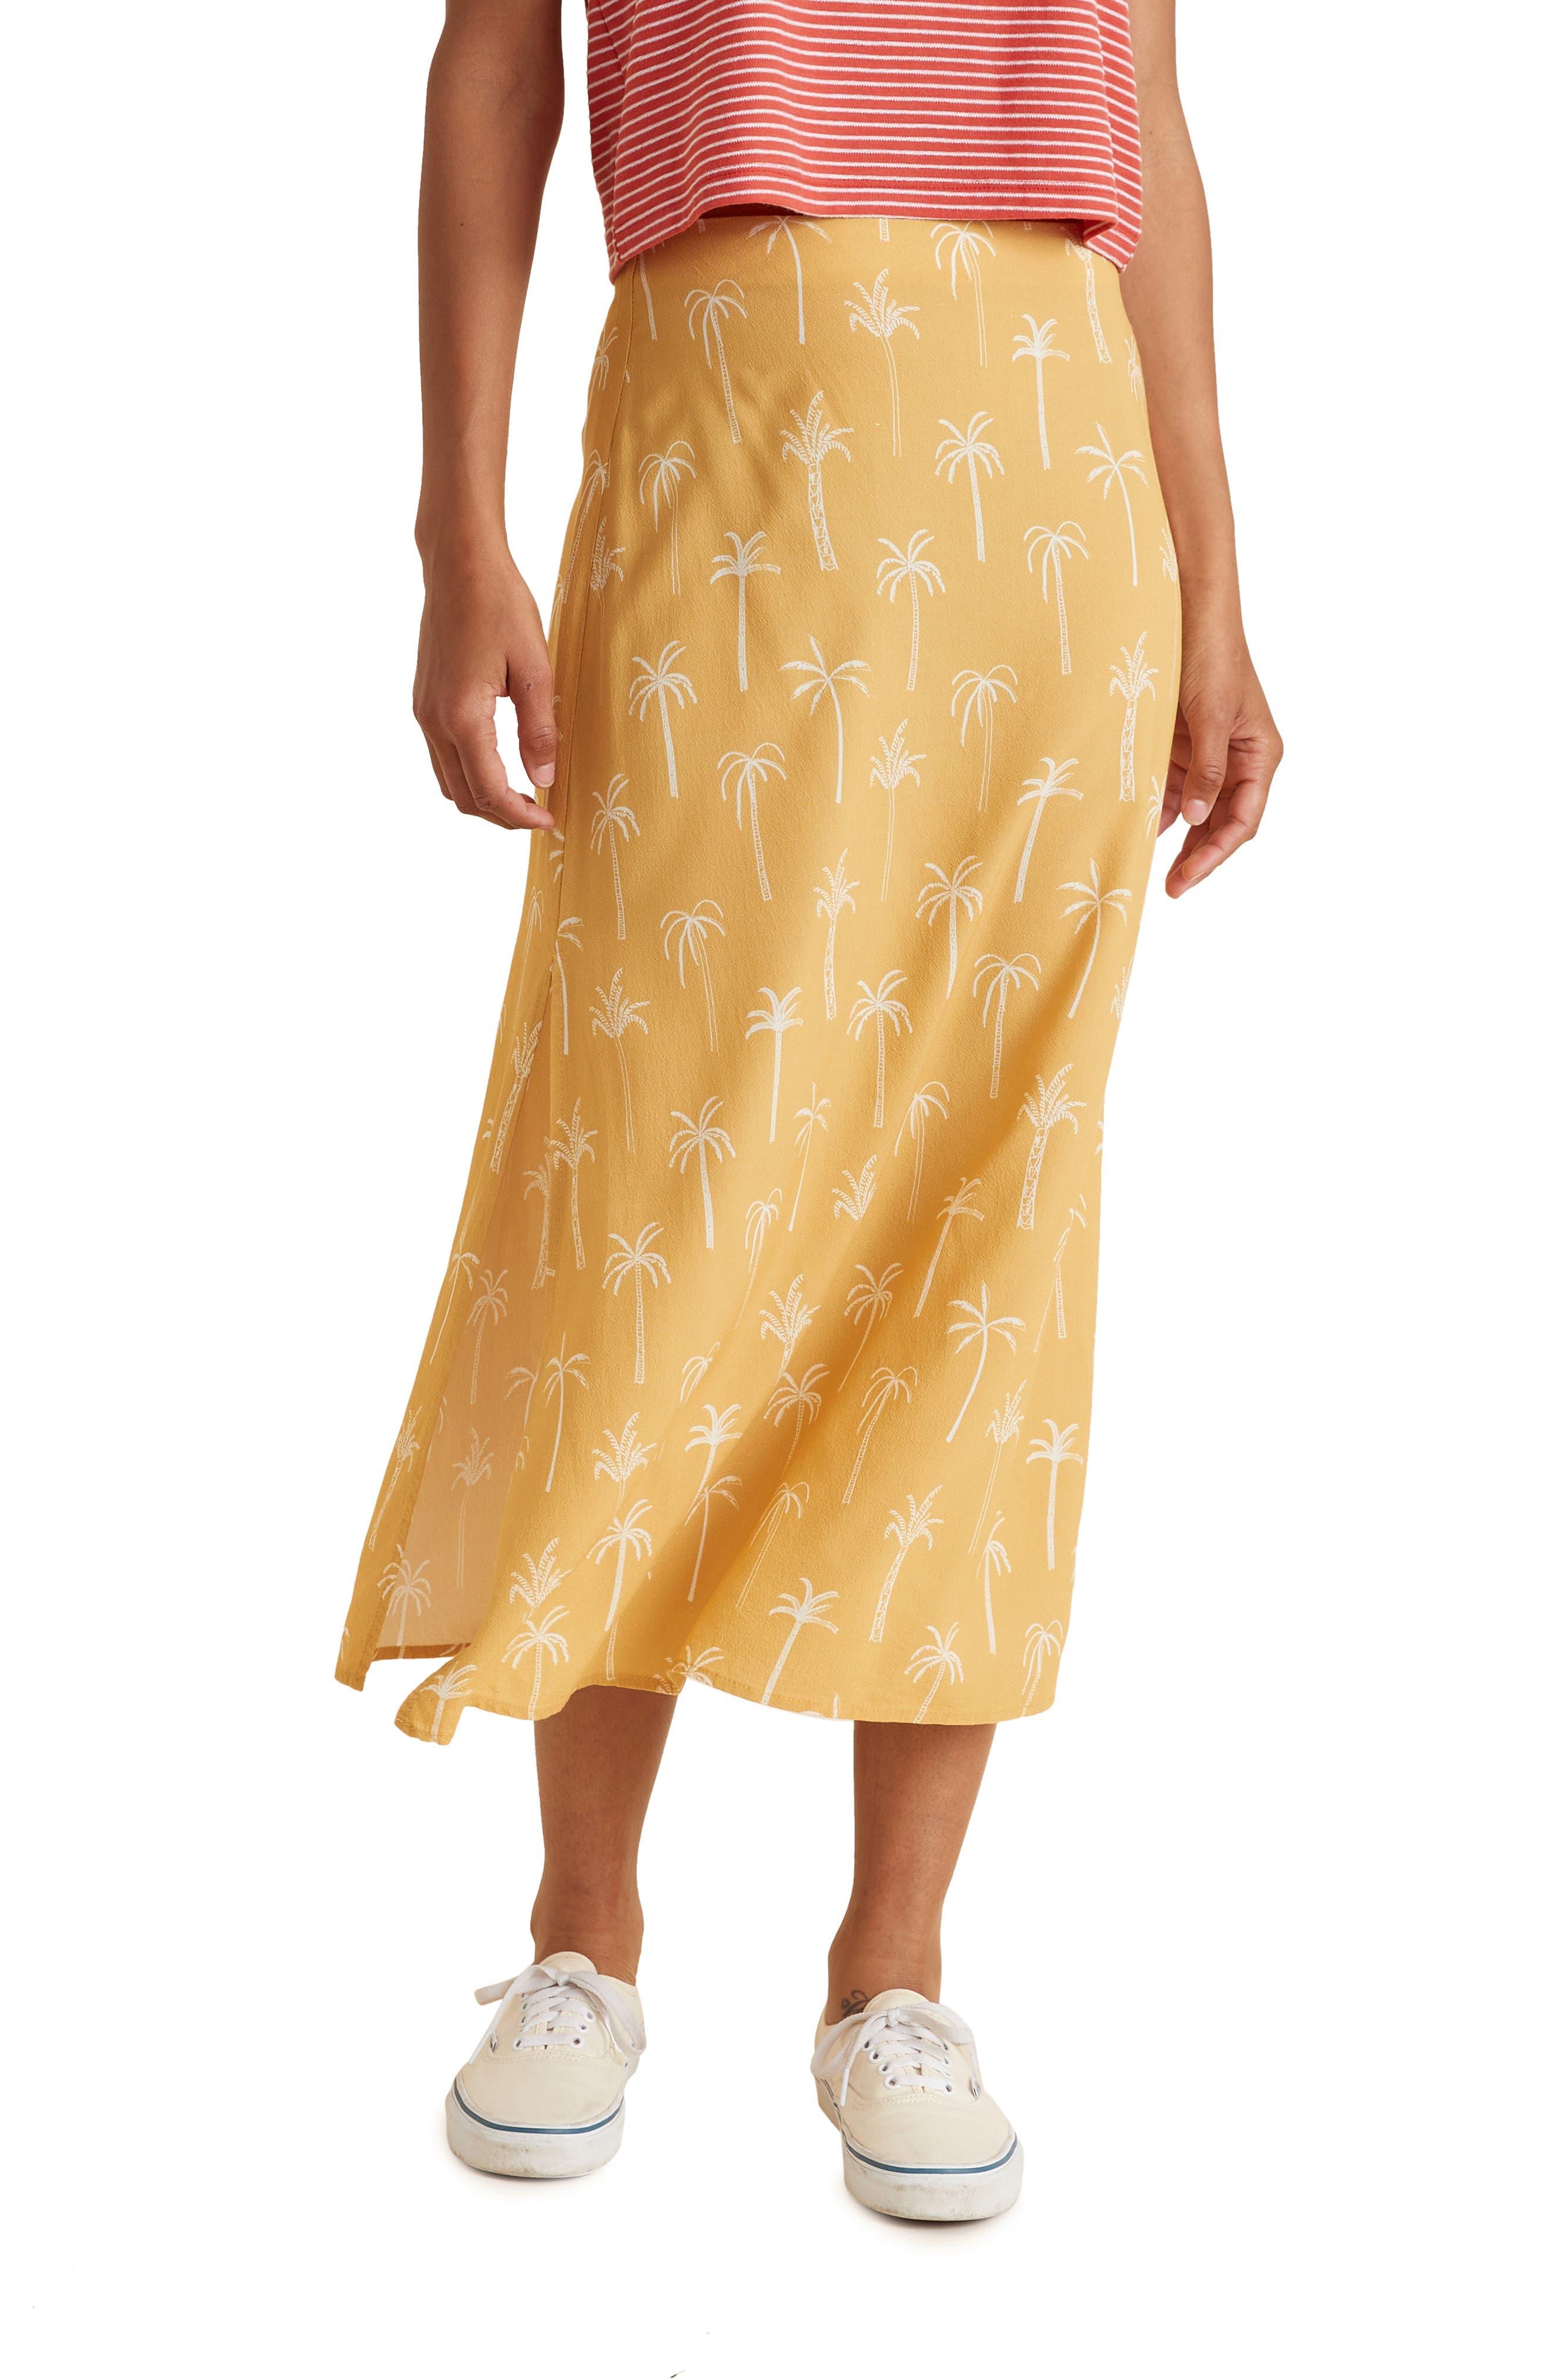 Ryan Palm Print Midi Skirt